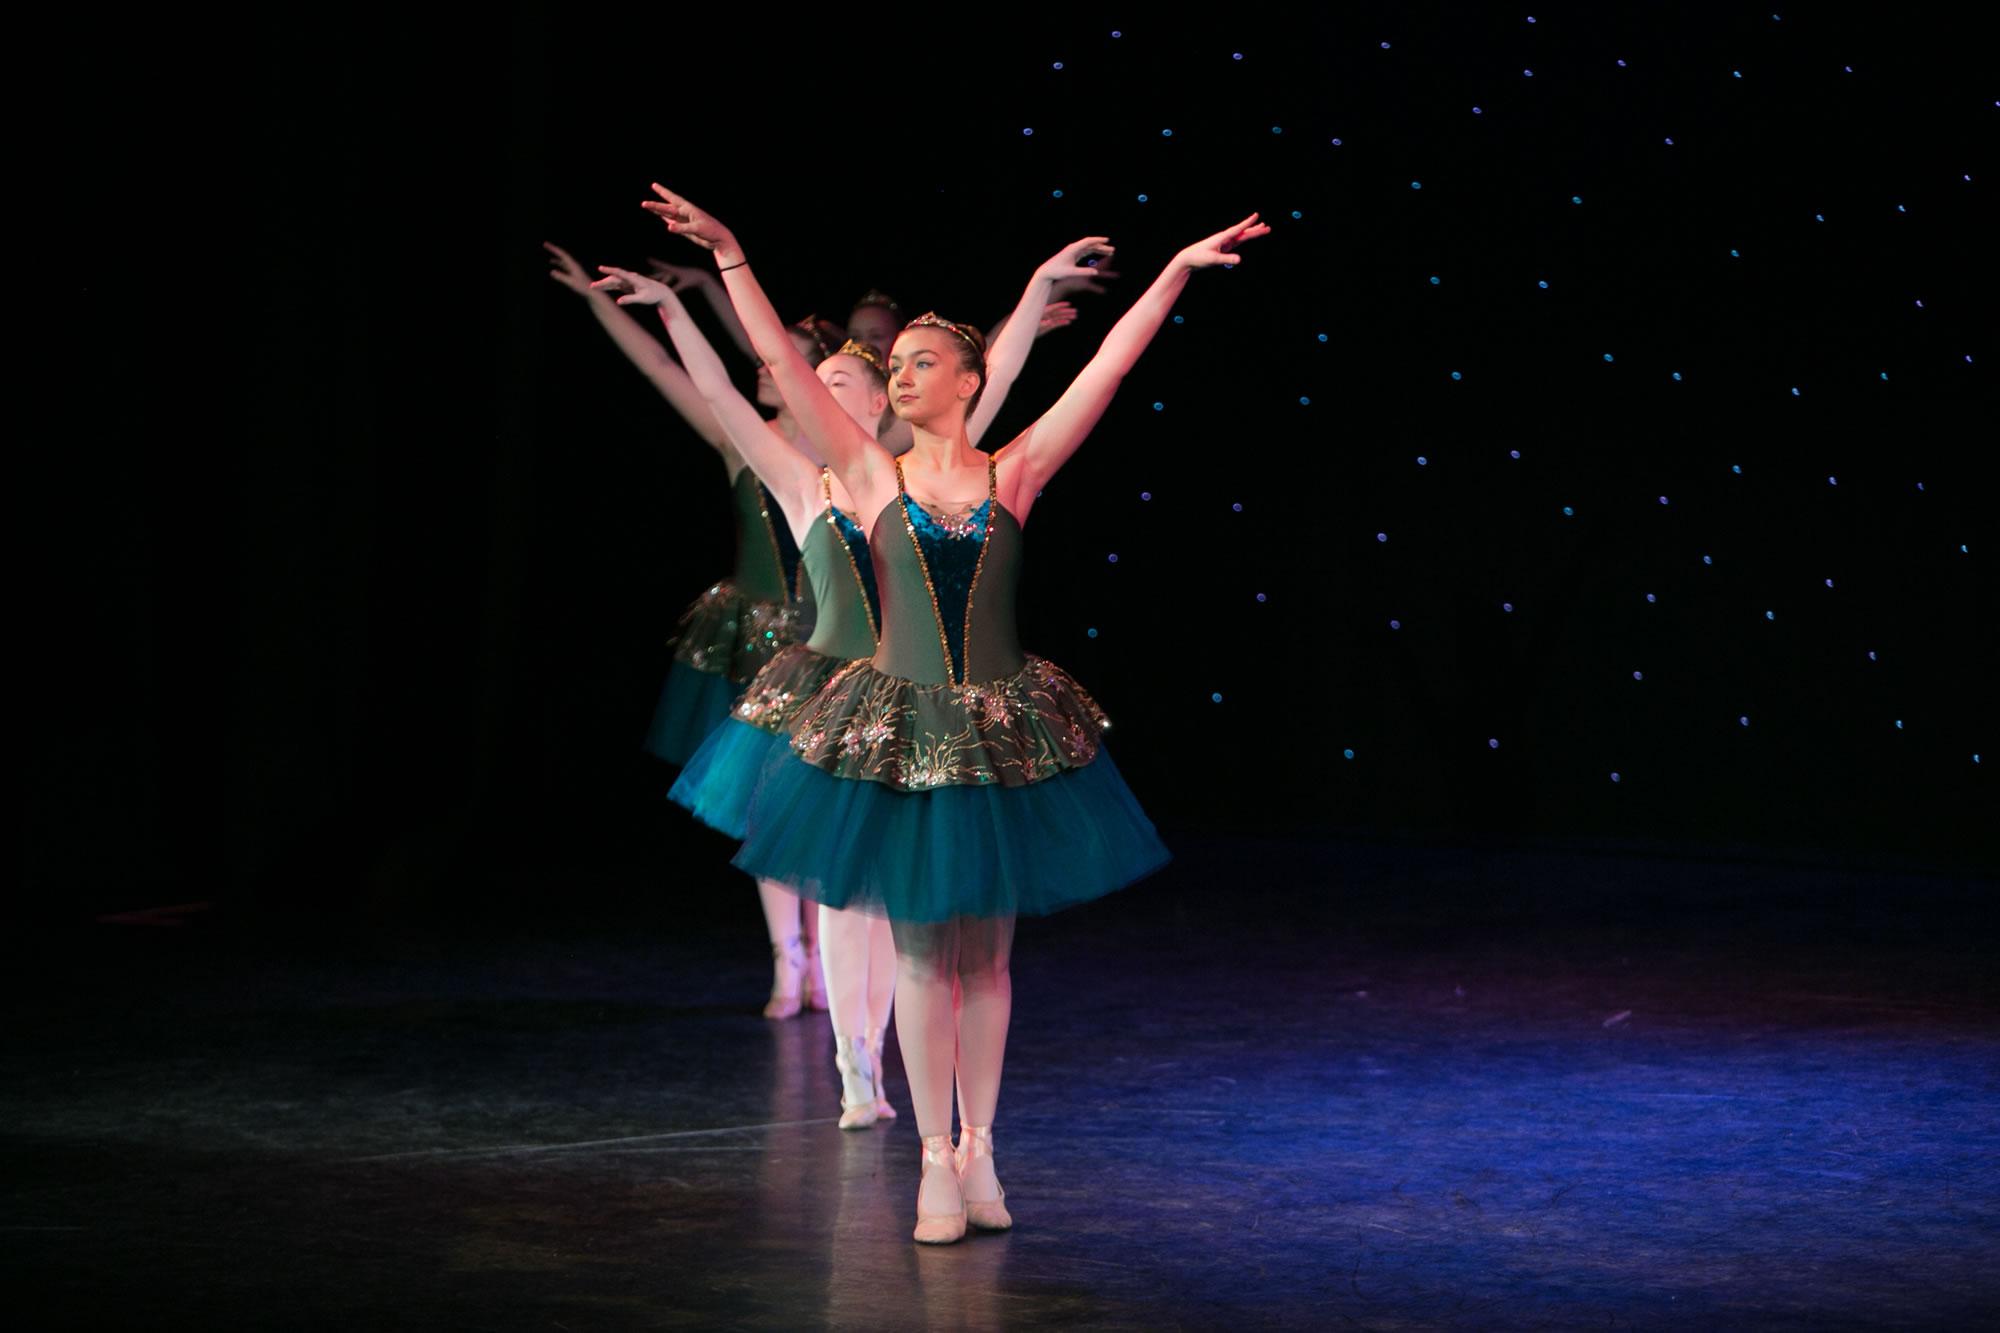 Hitchin_School_of_Dance_Show_2019-SM1_2237.jpg